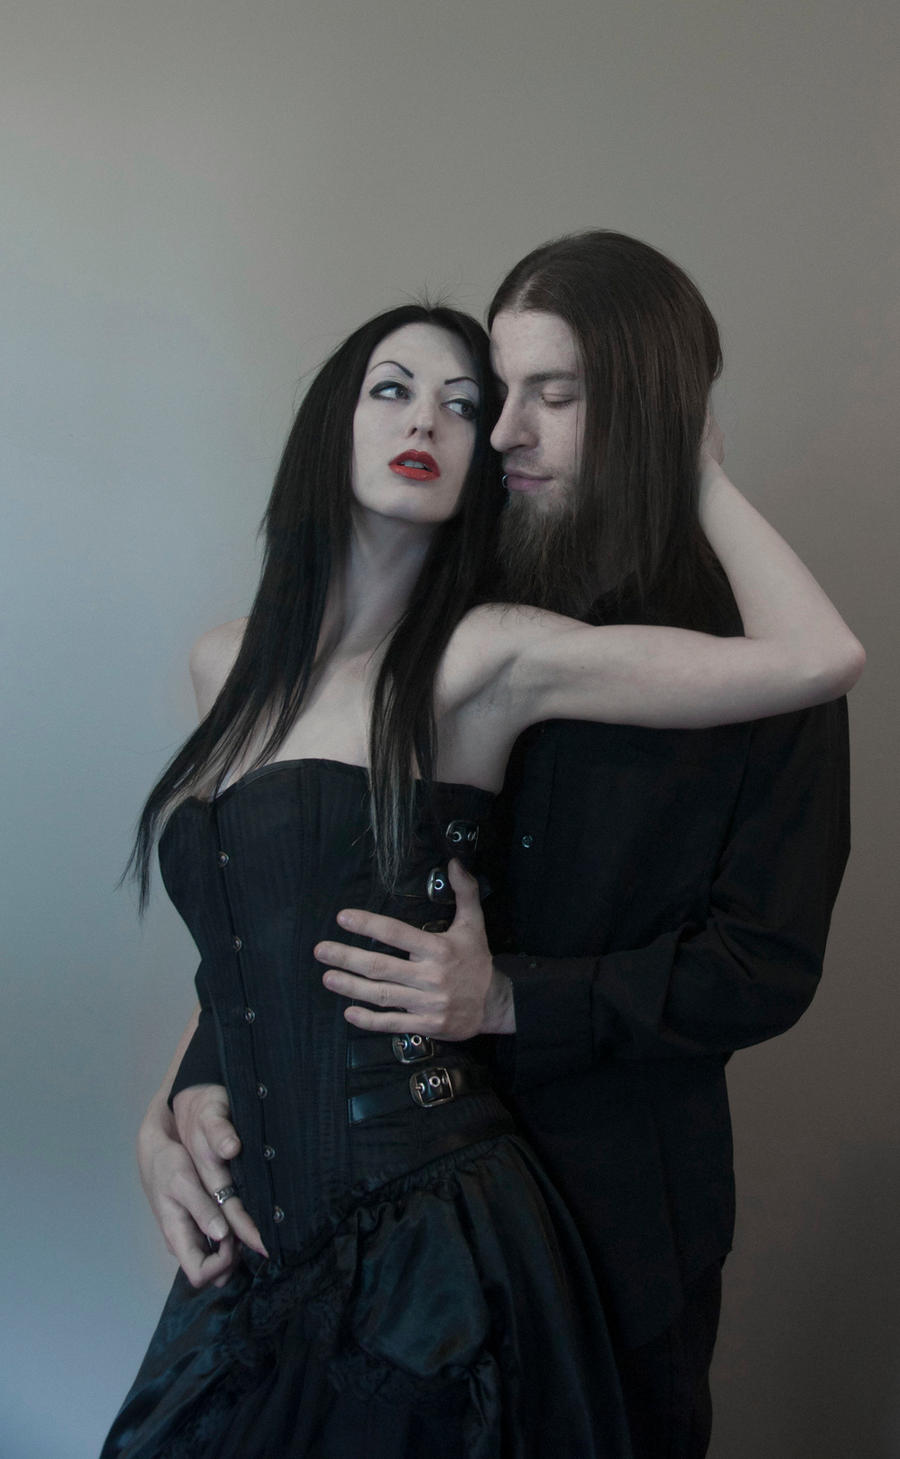 Gothic Love couple Wallpaper : Gothic Romance Stock 012 by MeetMeAtTheLake2Nite on DeviantArt